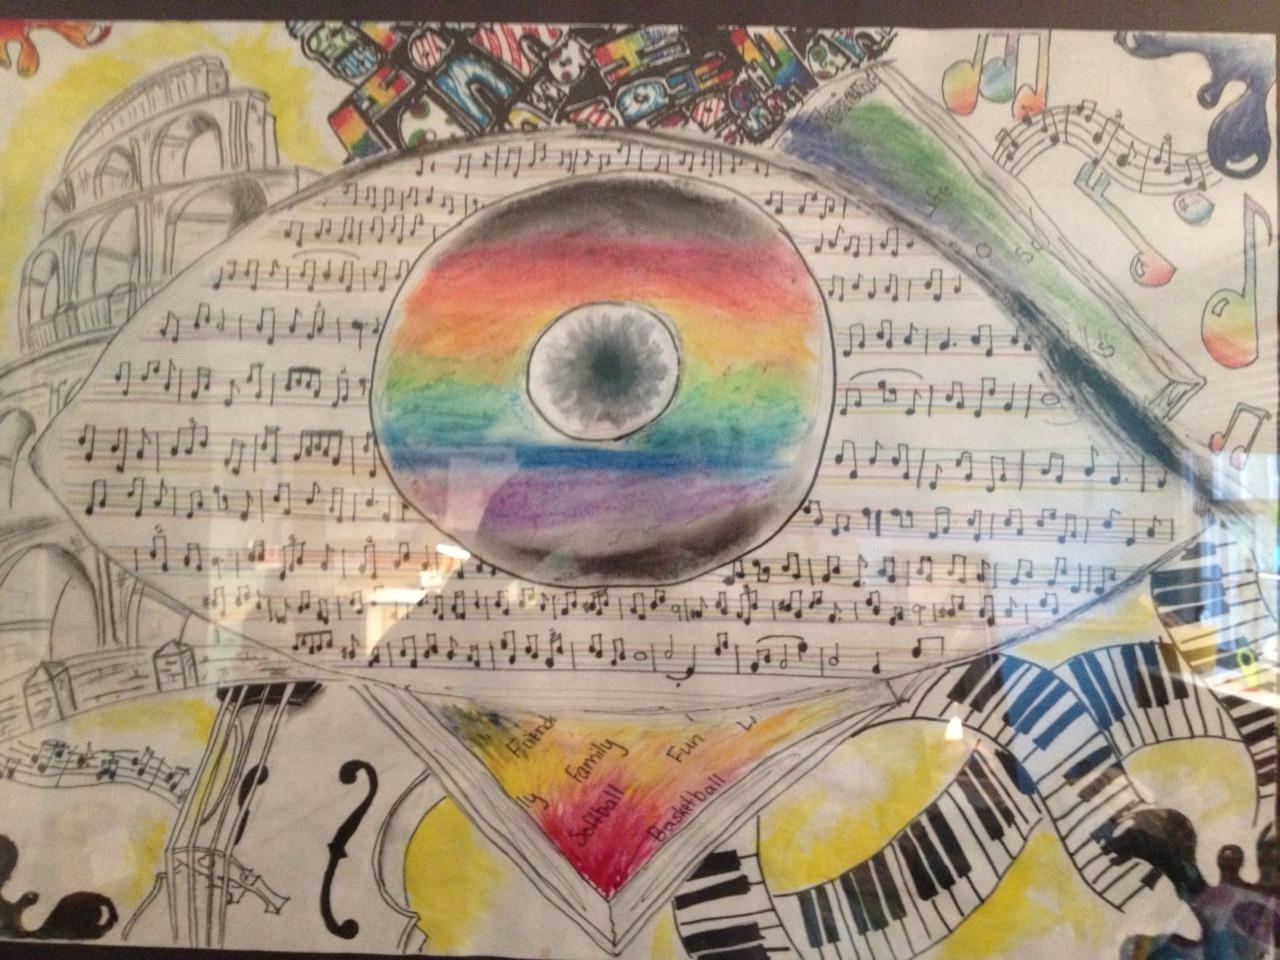 iheardtherewasasecretchord1:  art project